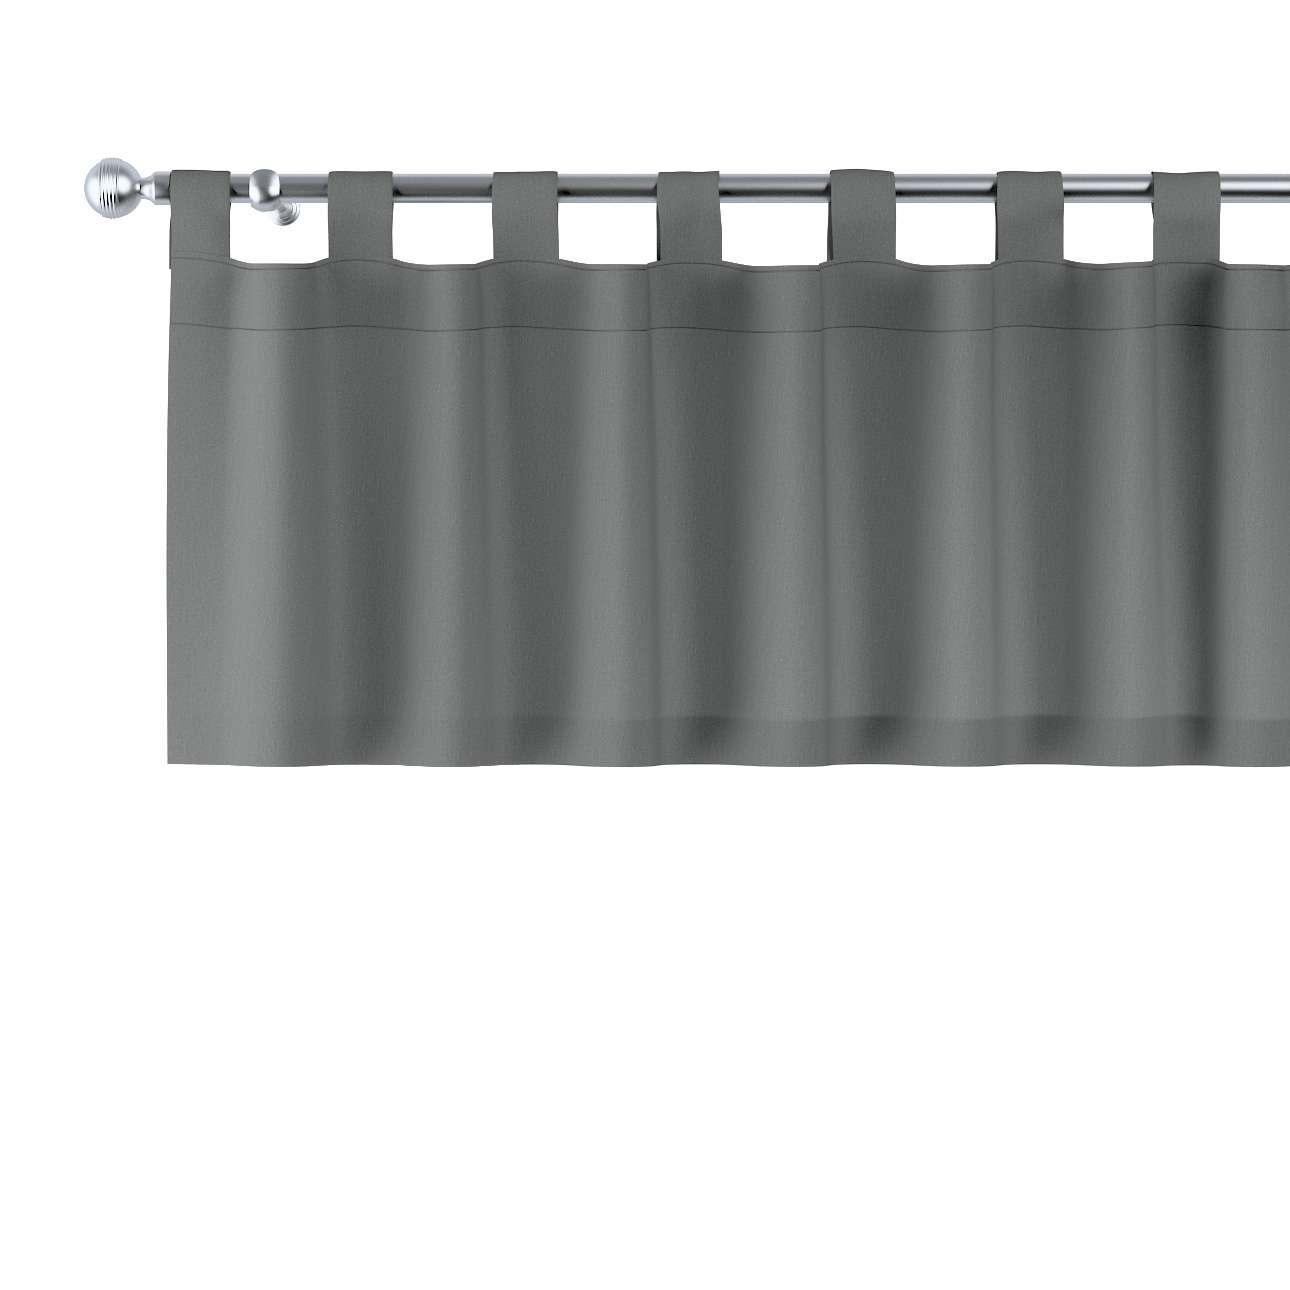 Lambrekin na szelkach 130x40cm w kolekcji Quadro, tkanina: 136-14